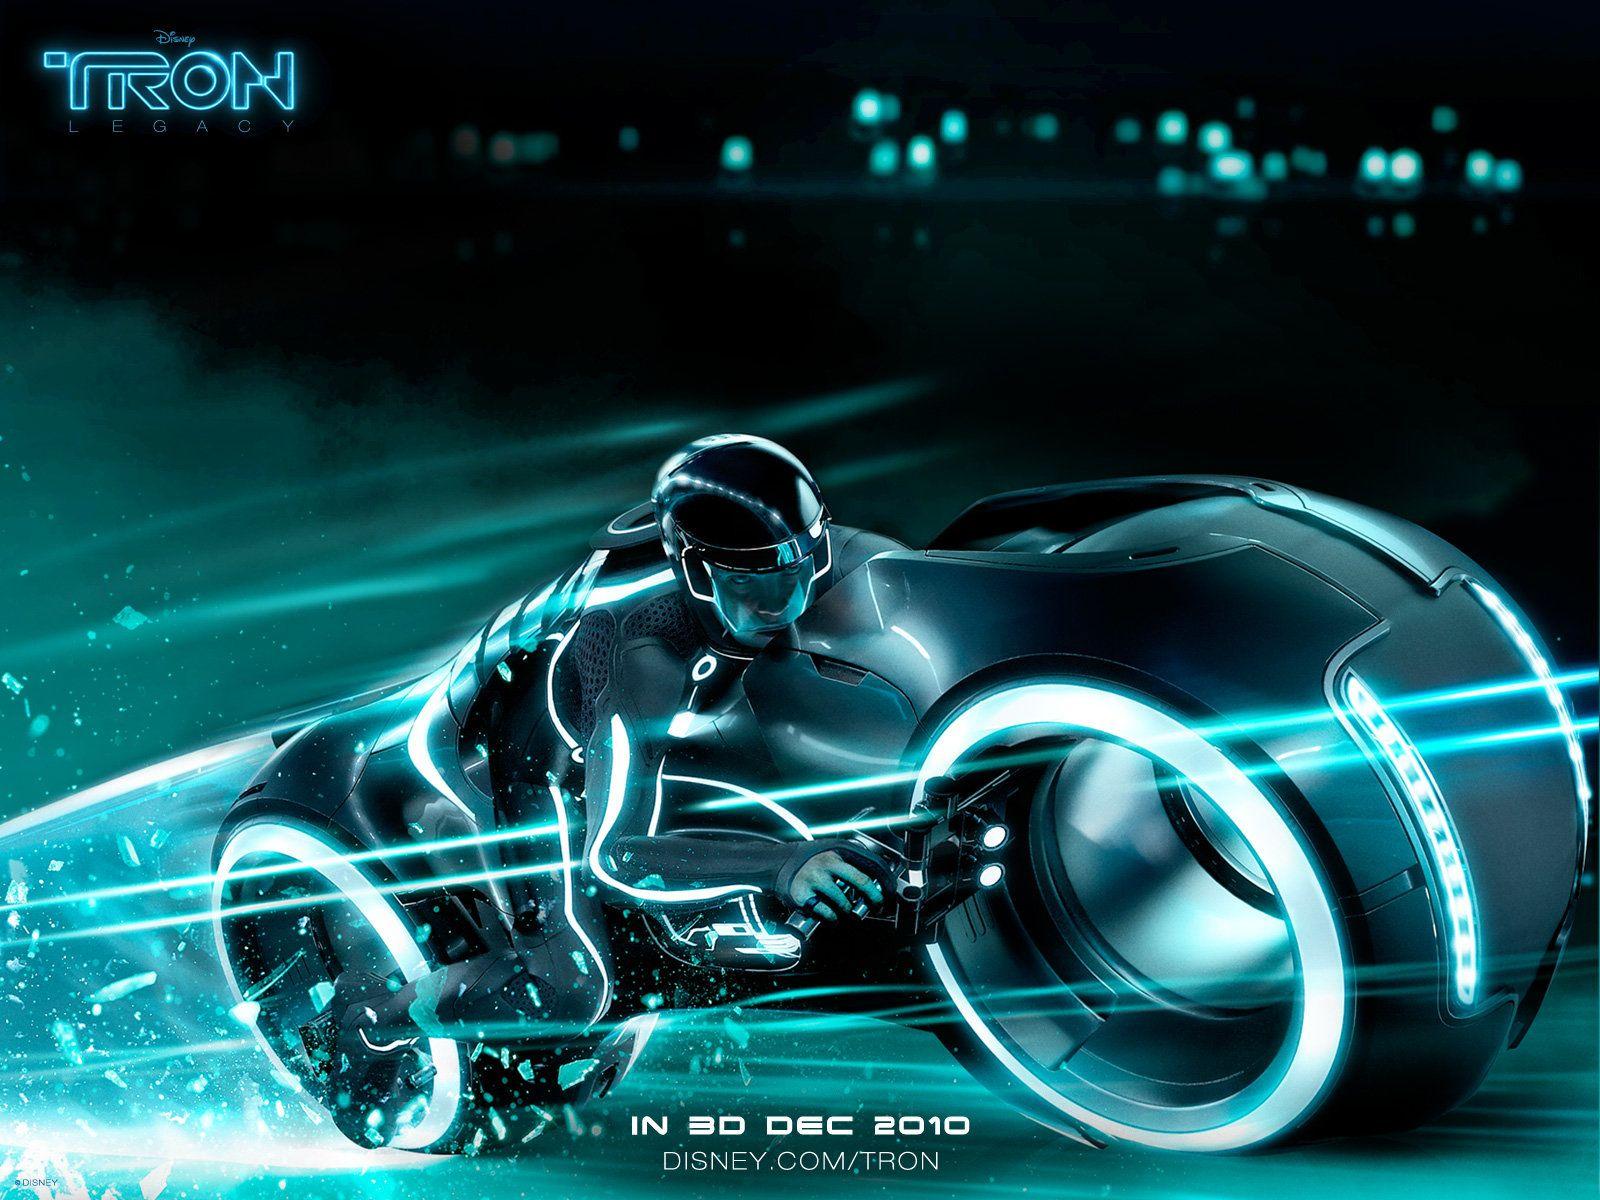 Tron неон мотоциклы  № 3312169 бесплатно